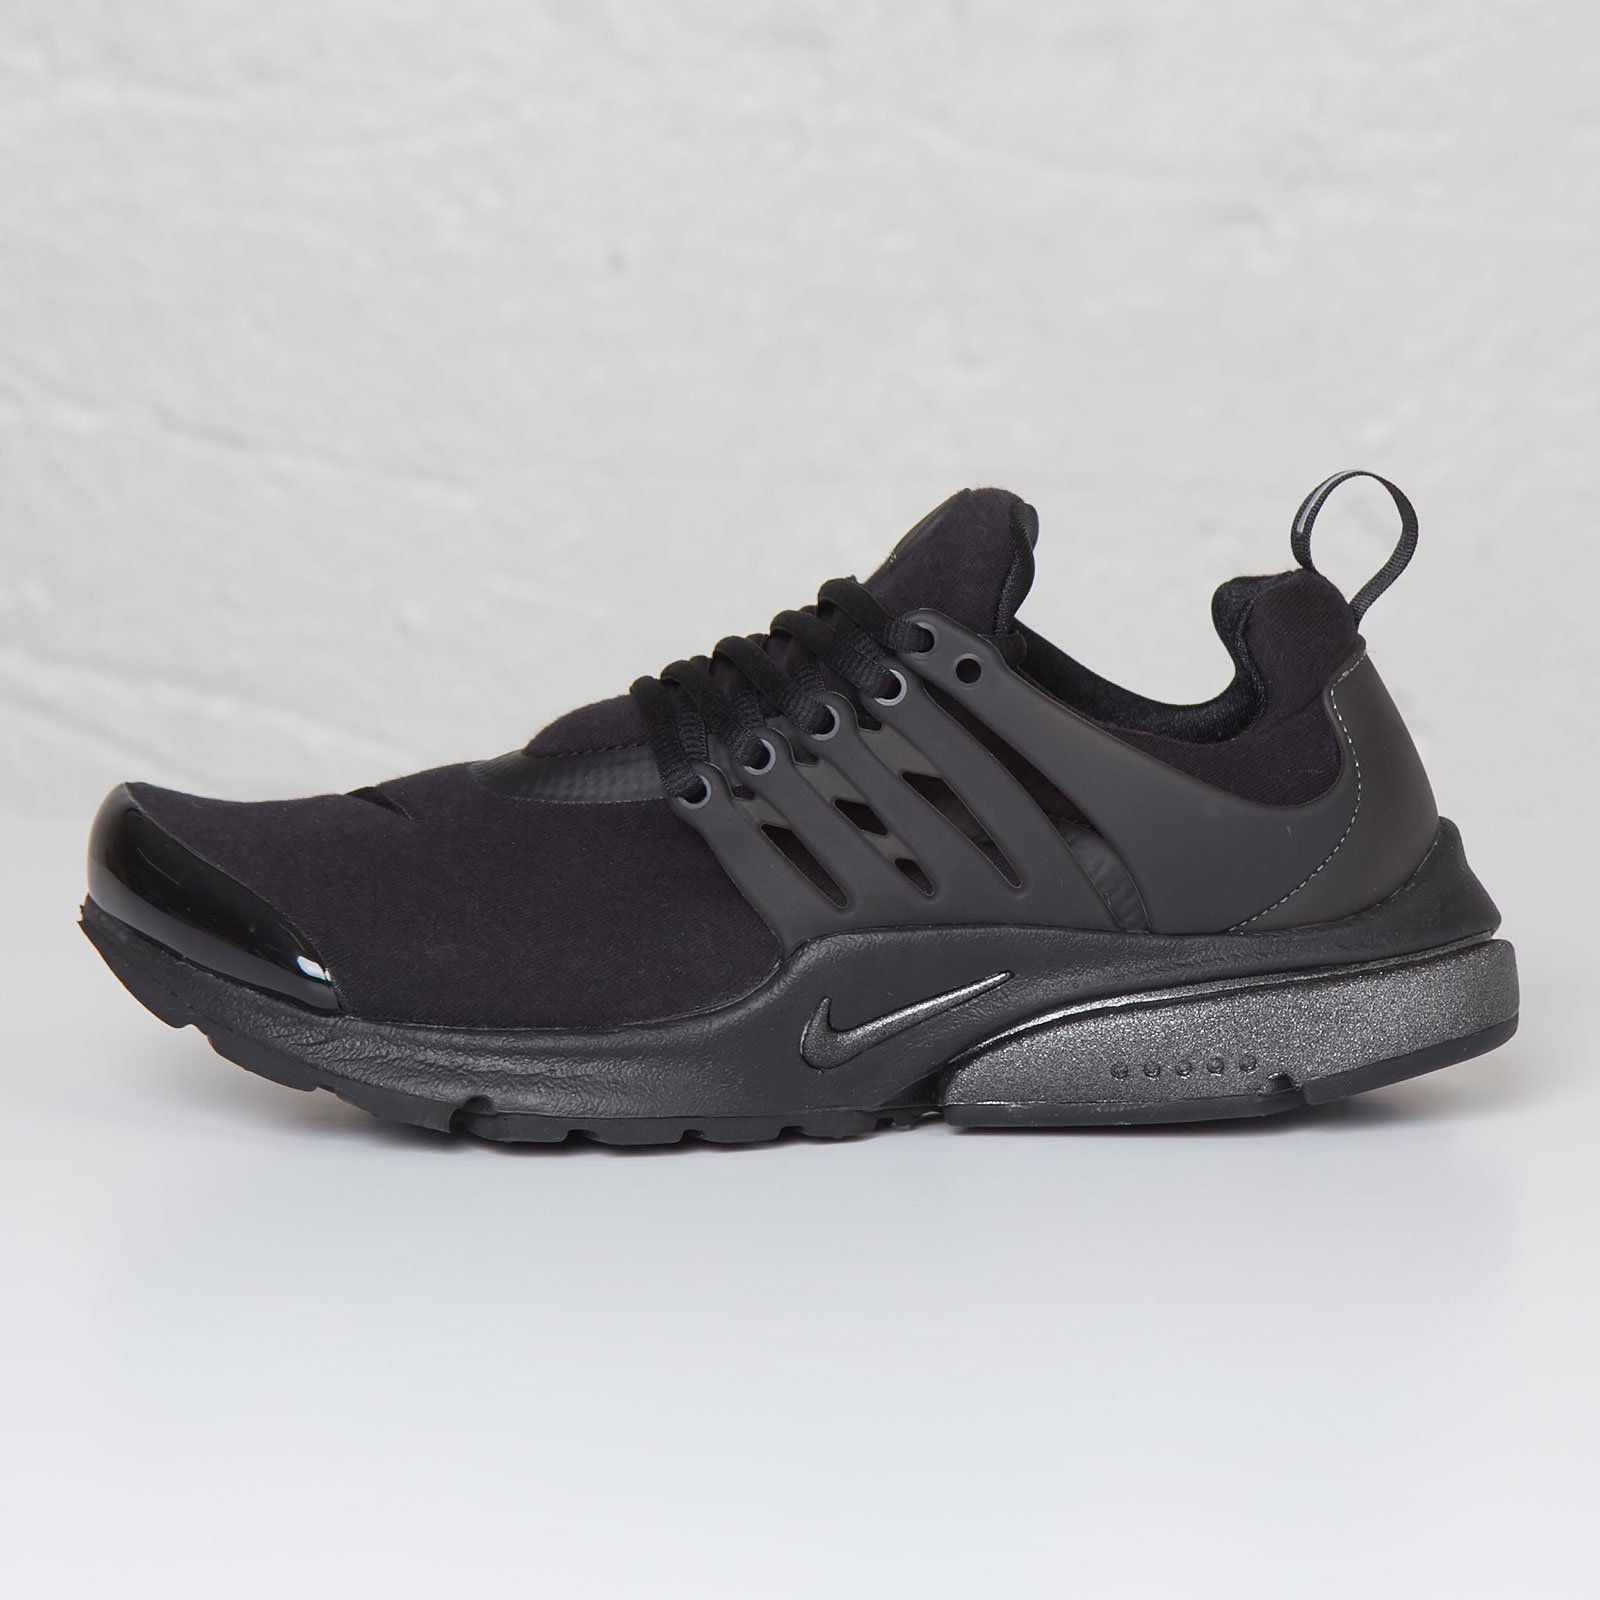 Nike Air Presto Fleece 812307 002 Sneakersnstuff